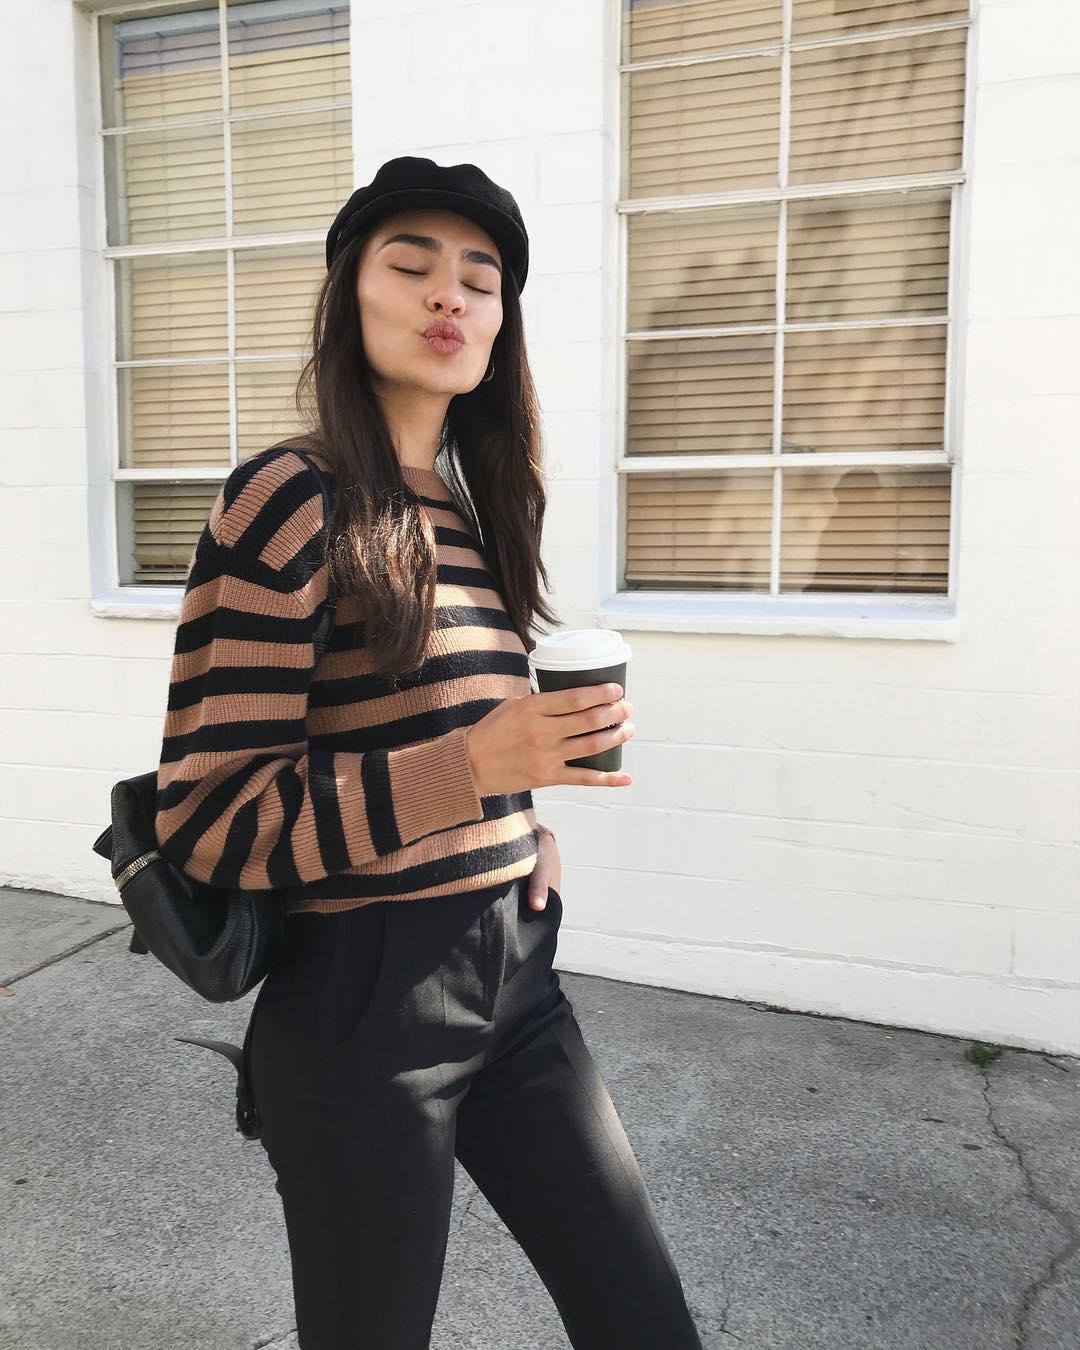 Kaitlyn-Fitzpatrick-Wallpapers-Insta-Fit-Bio-9